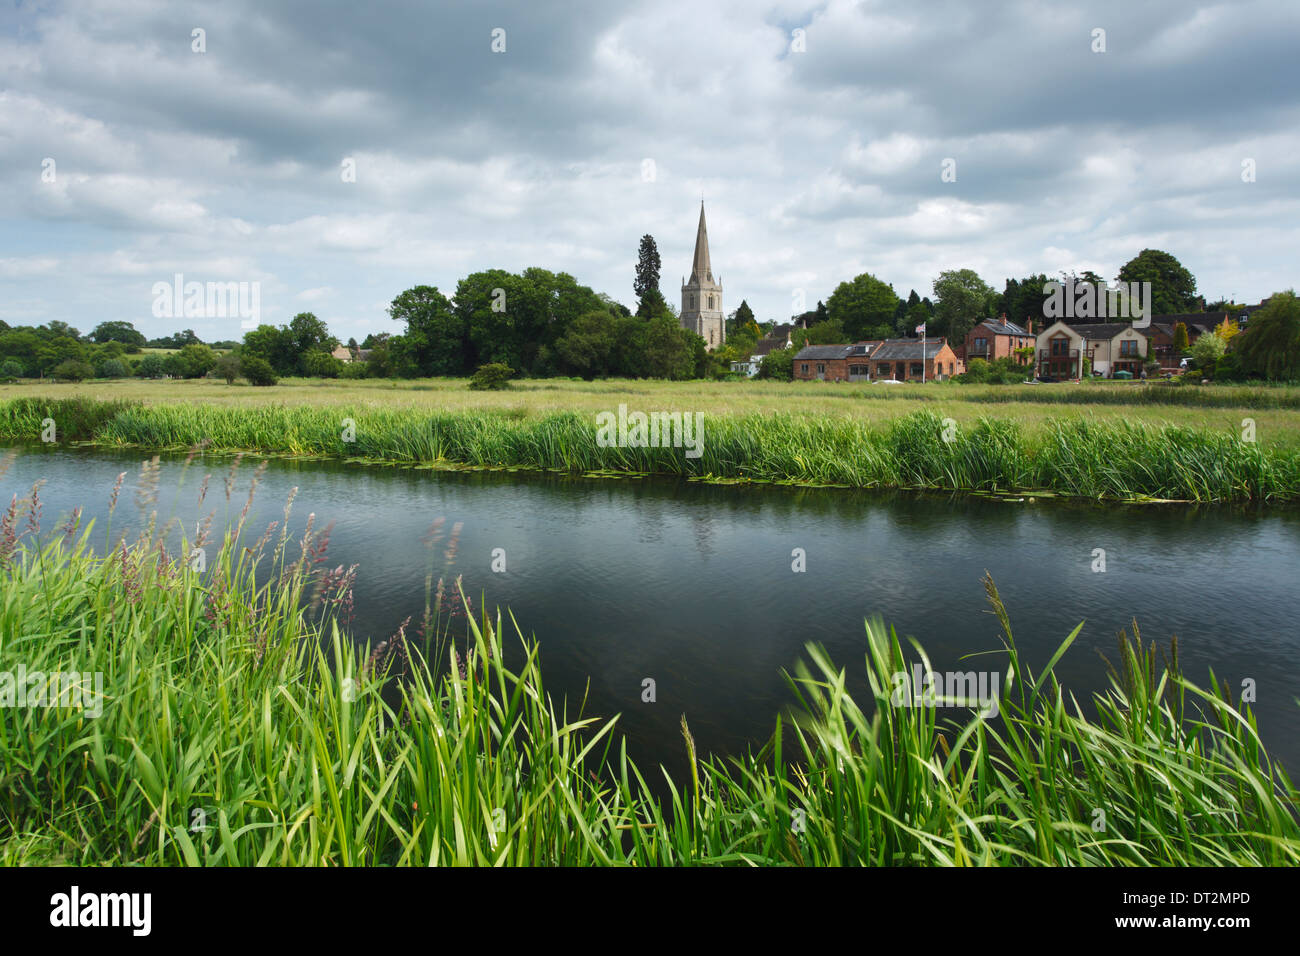 River Nene at Denford. Nene Valley. Northamptonshire. England. UK. - Stock Image